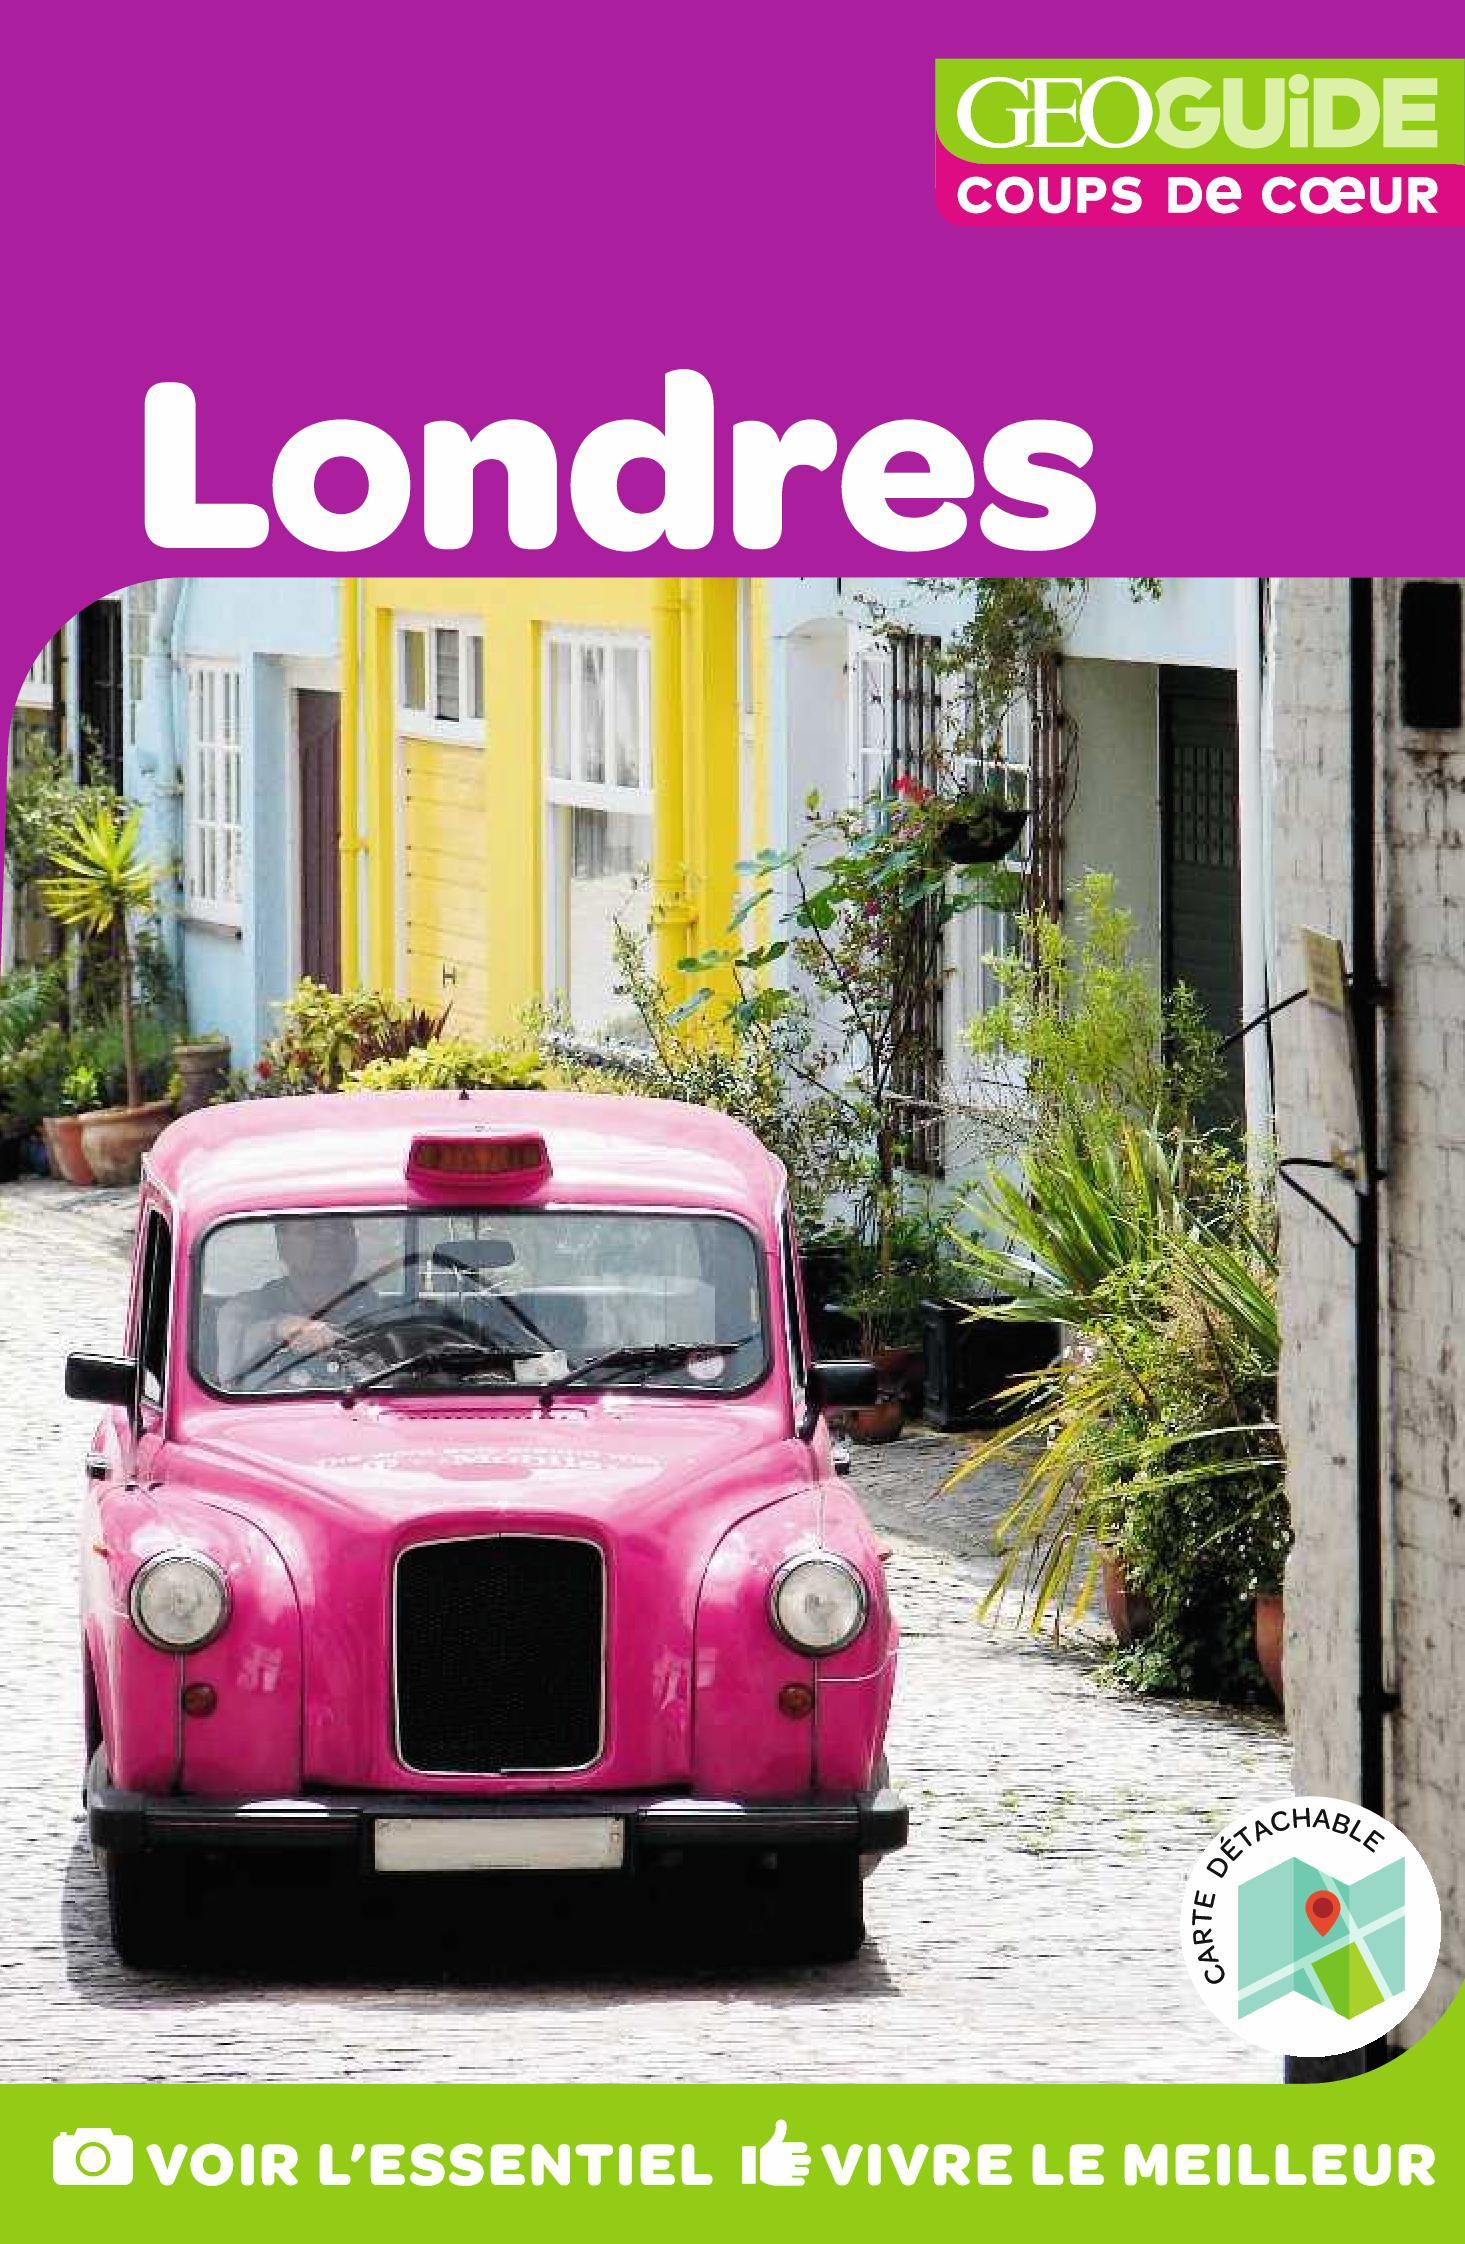 GEOguide Coups de coeur Londres | Collectif Gallimard Loisirs,